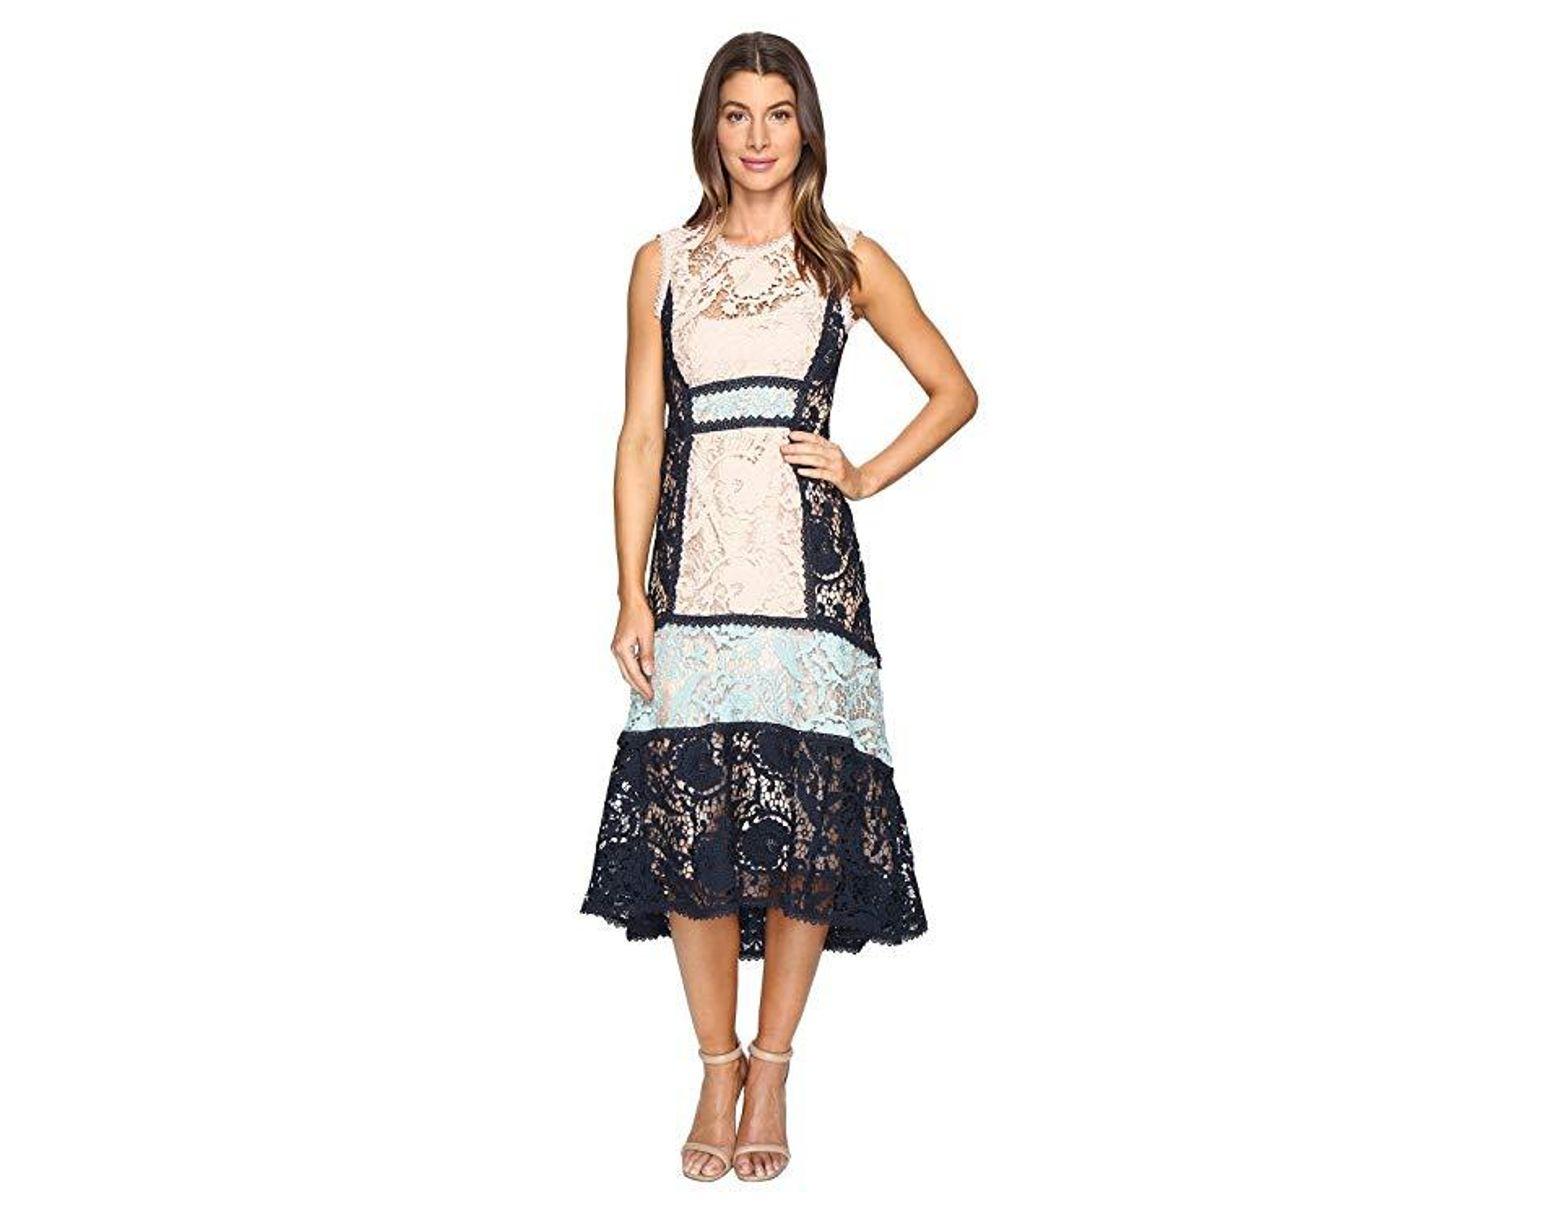 212e7bba46388 Nanette Lepore Baroque Lace Dress (petal Navy) Dress in Blue - Save 36% -  Lyst